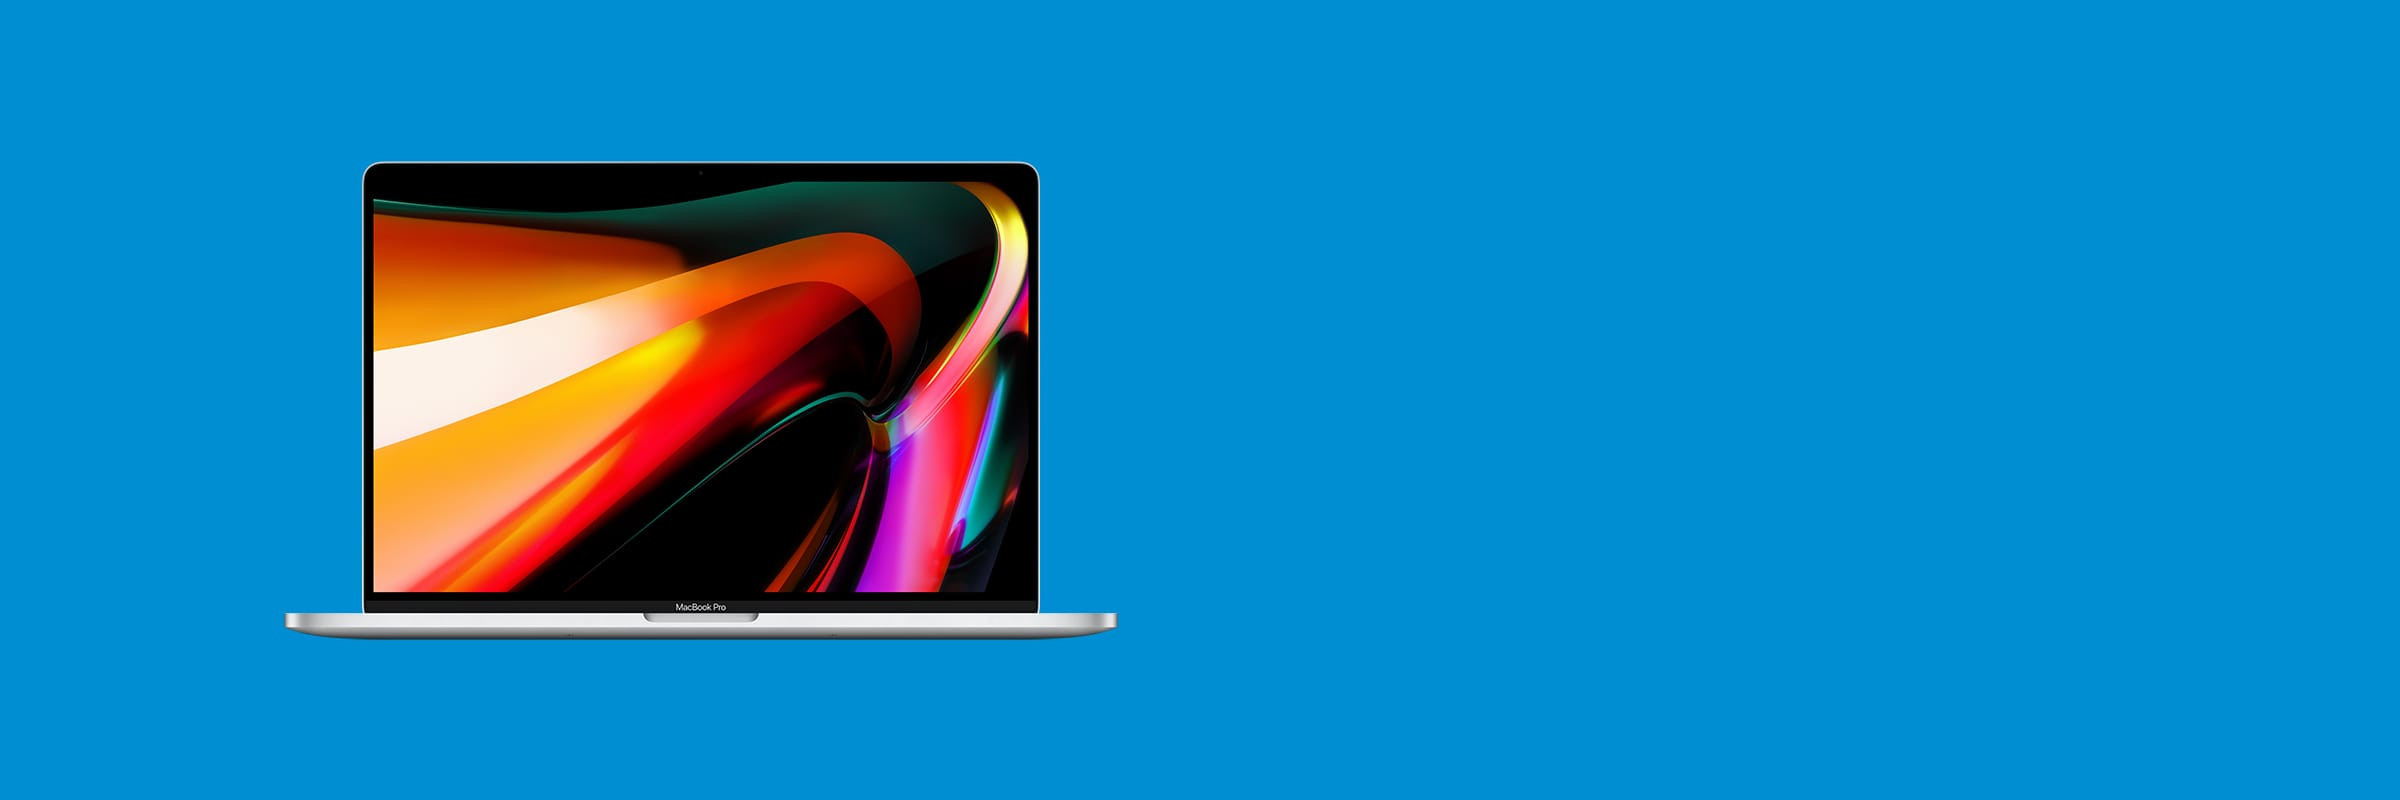 homeslider-macbook-pro-16.jpg